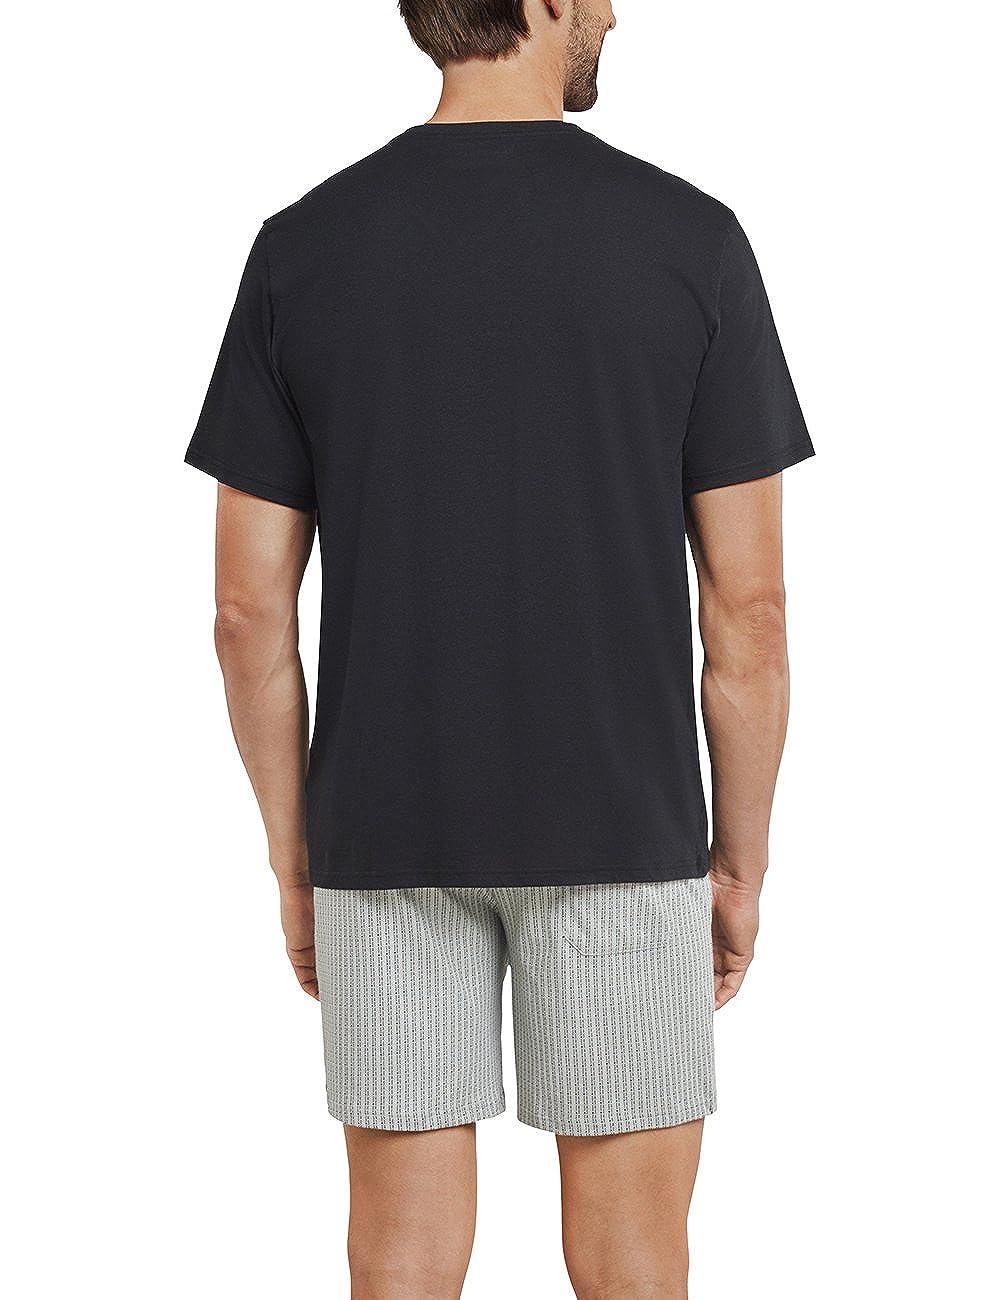 Pantaloni Pigiama Uomo Schiesser Anzug Kurz